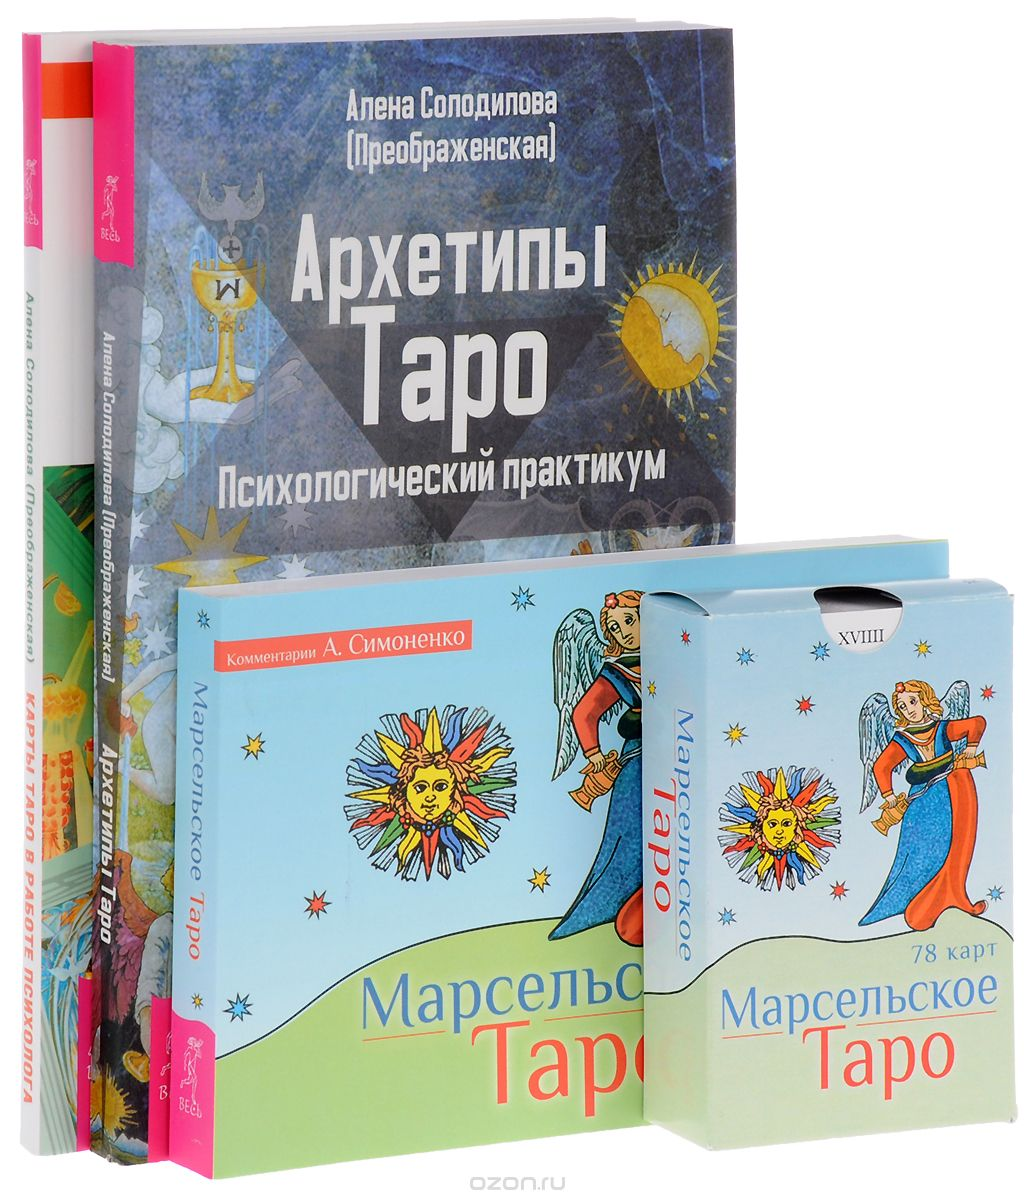 Алена Солодилова (Преображенская): Марсельское Таро. Архетипы Таро. Карты Таро в работе психолога (комплект из 3 книг + 78 карт таро)